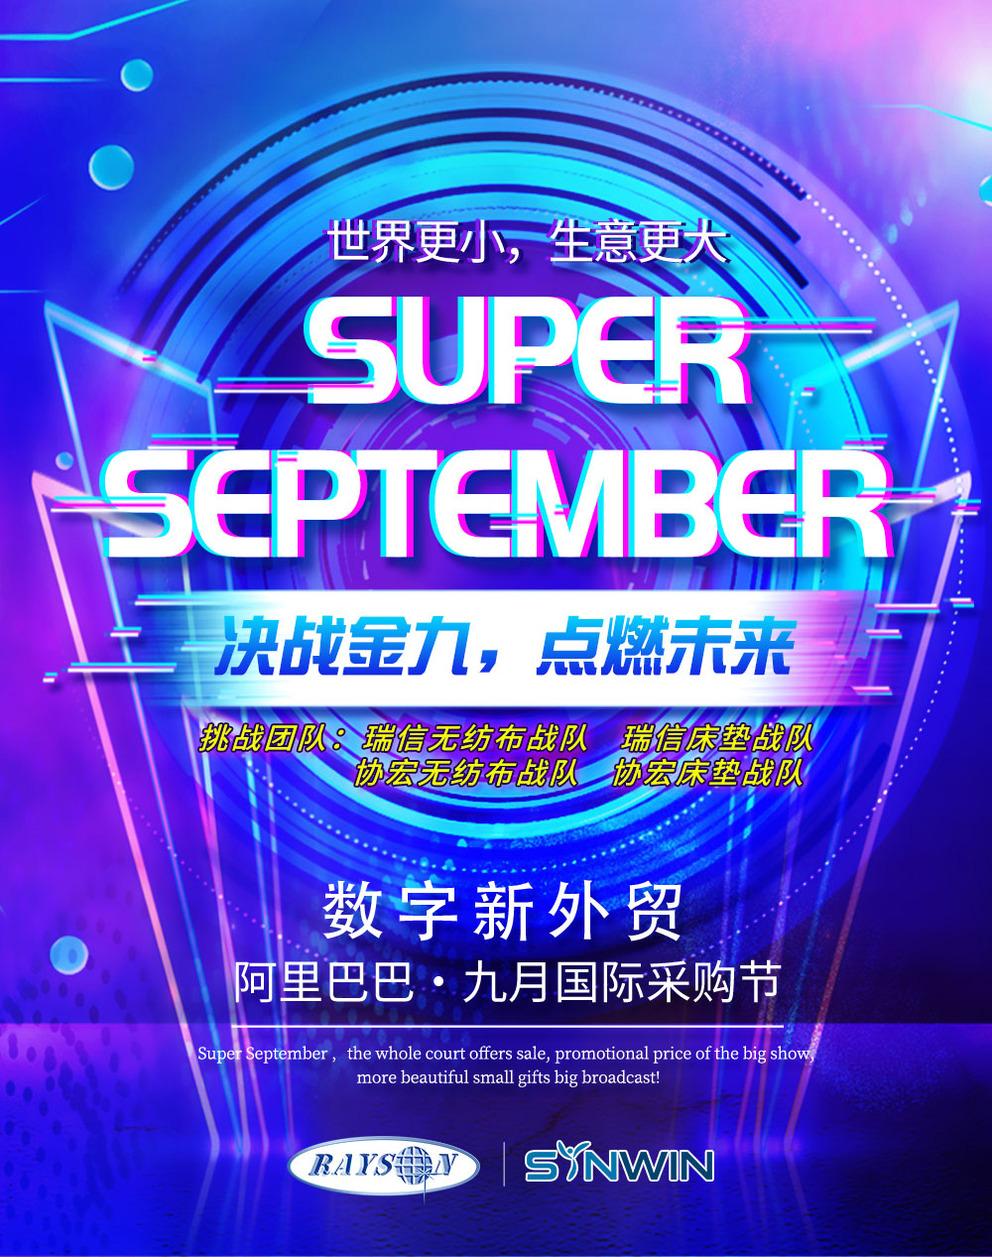 September procurement Festival is coming